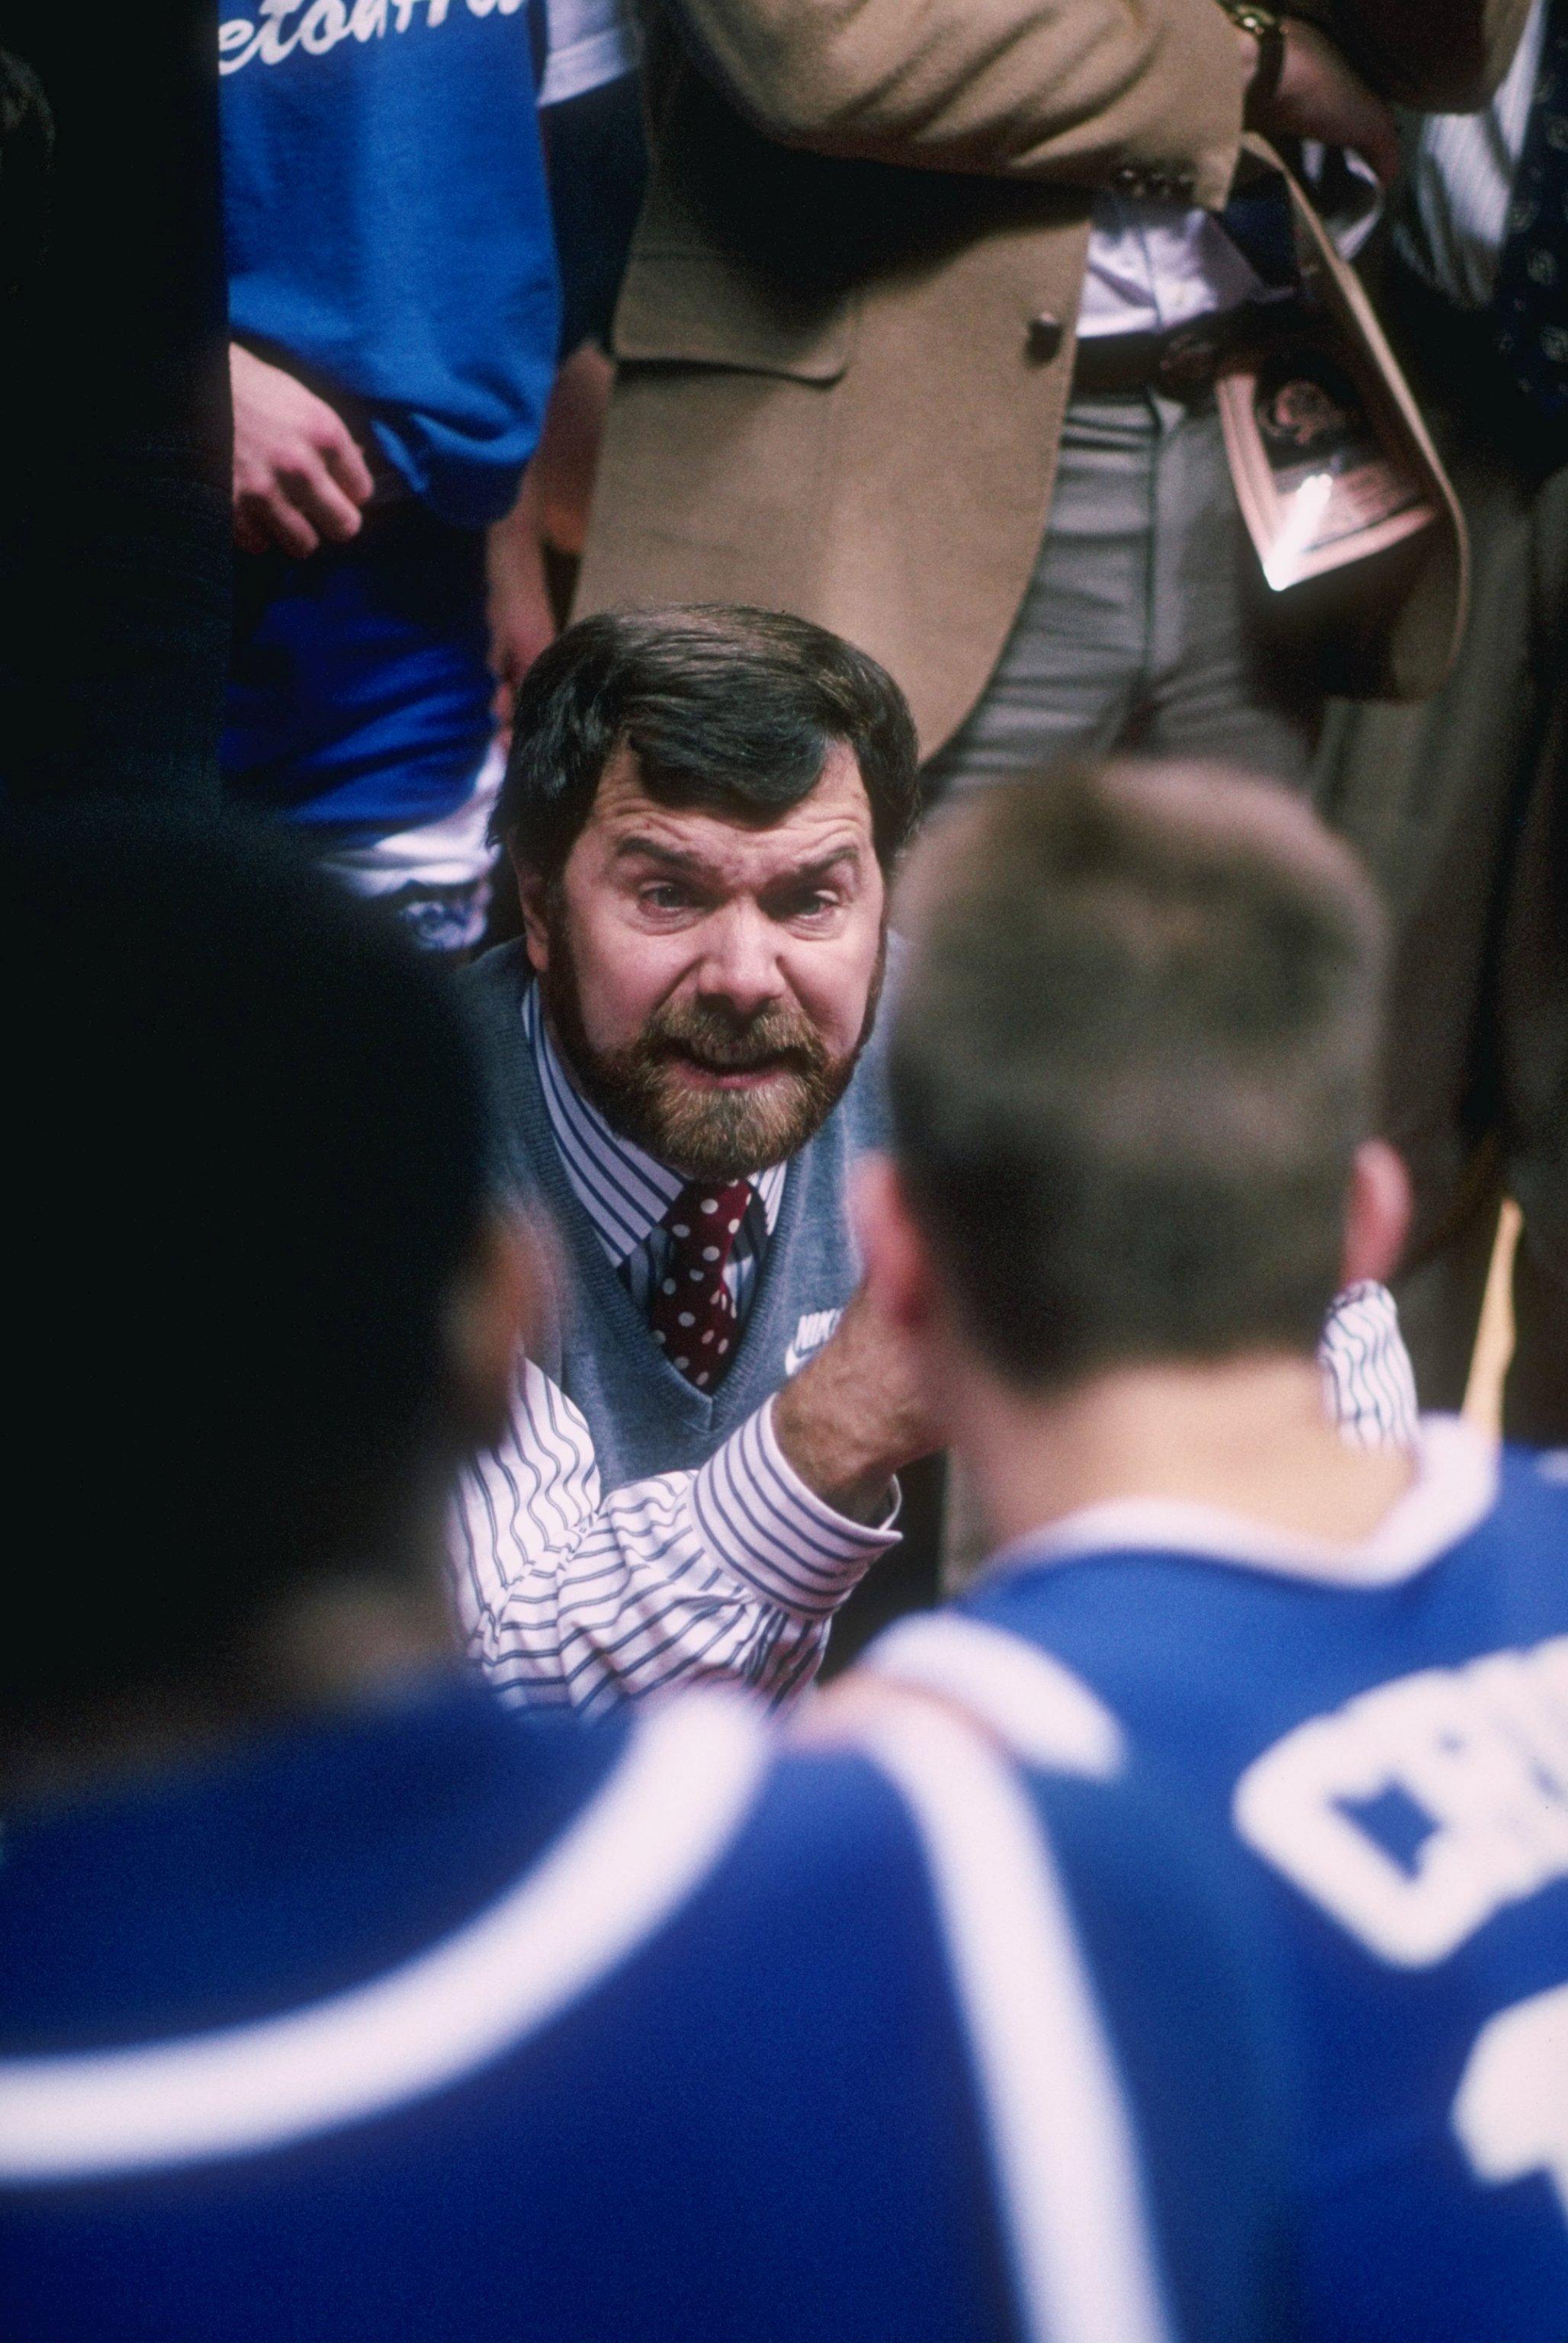 1989:  Head coach P.J. Carlesimo of Seton Hall University talks with his team during a Seton Hall Pirates game. Mandatory Credit: Stephen Dunn  /Allsport